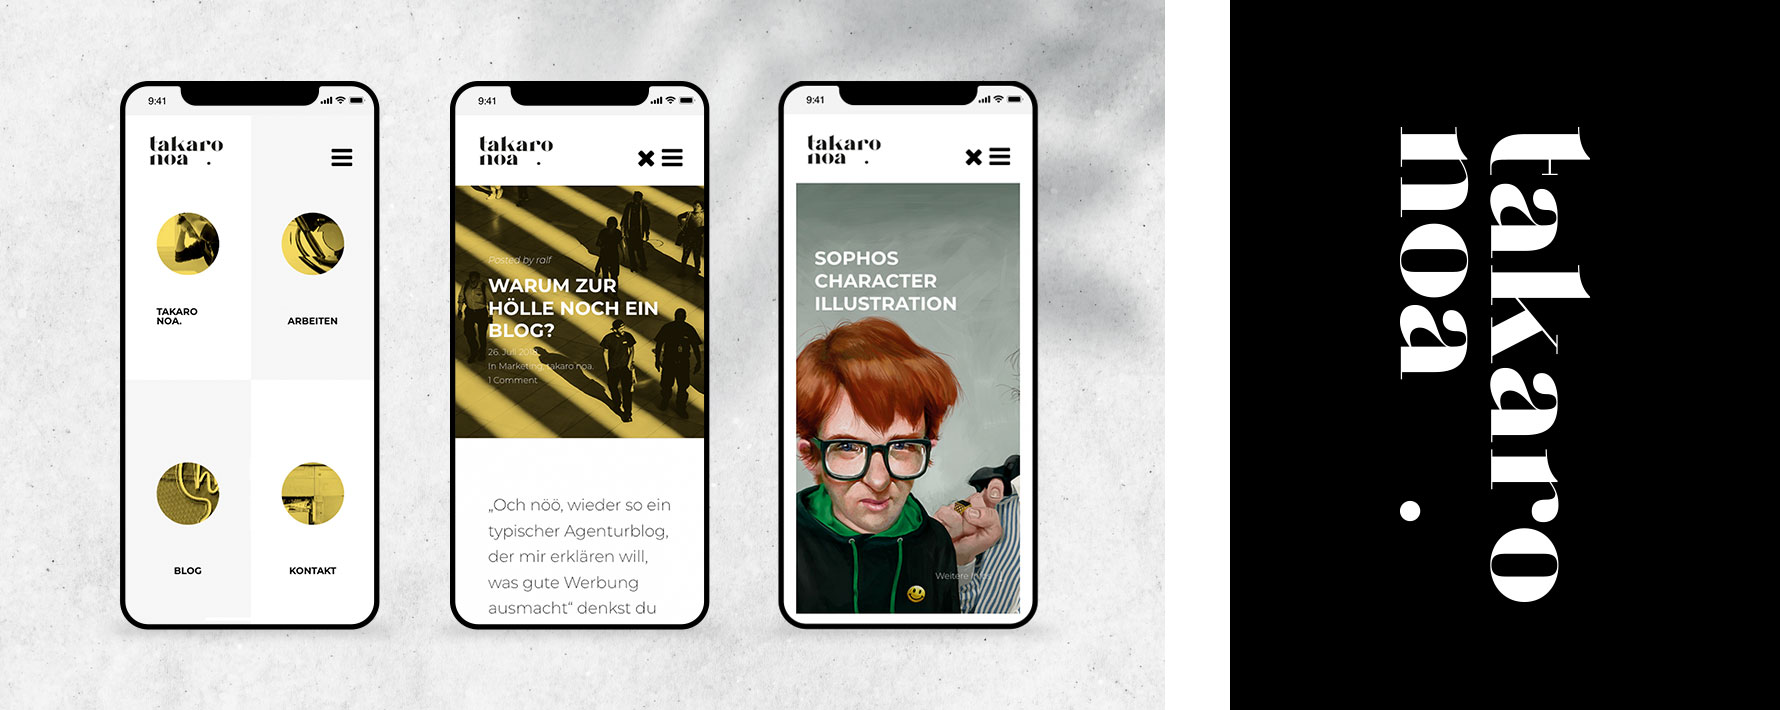 Hüfner Design | Referenz takaro noa | Responsive Webdesign